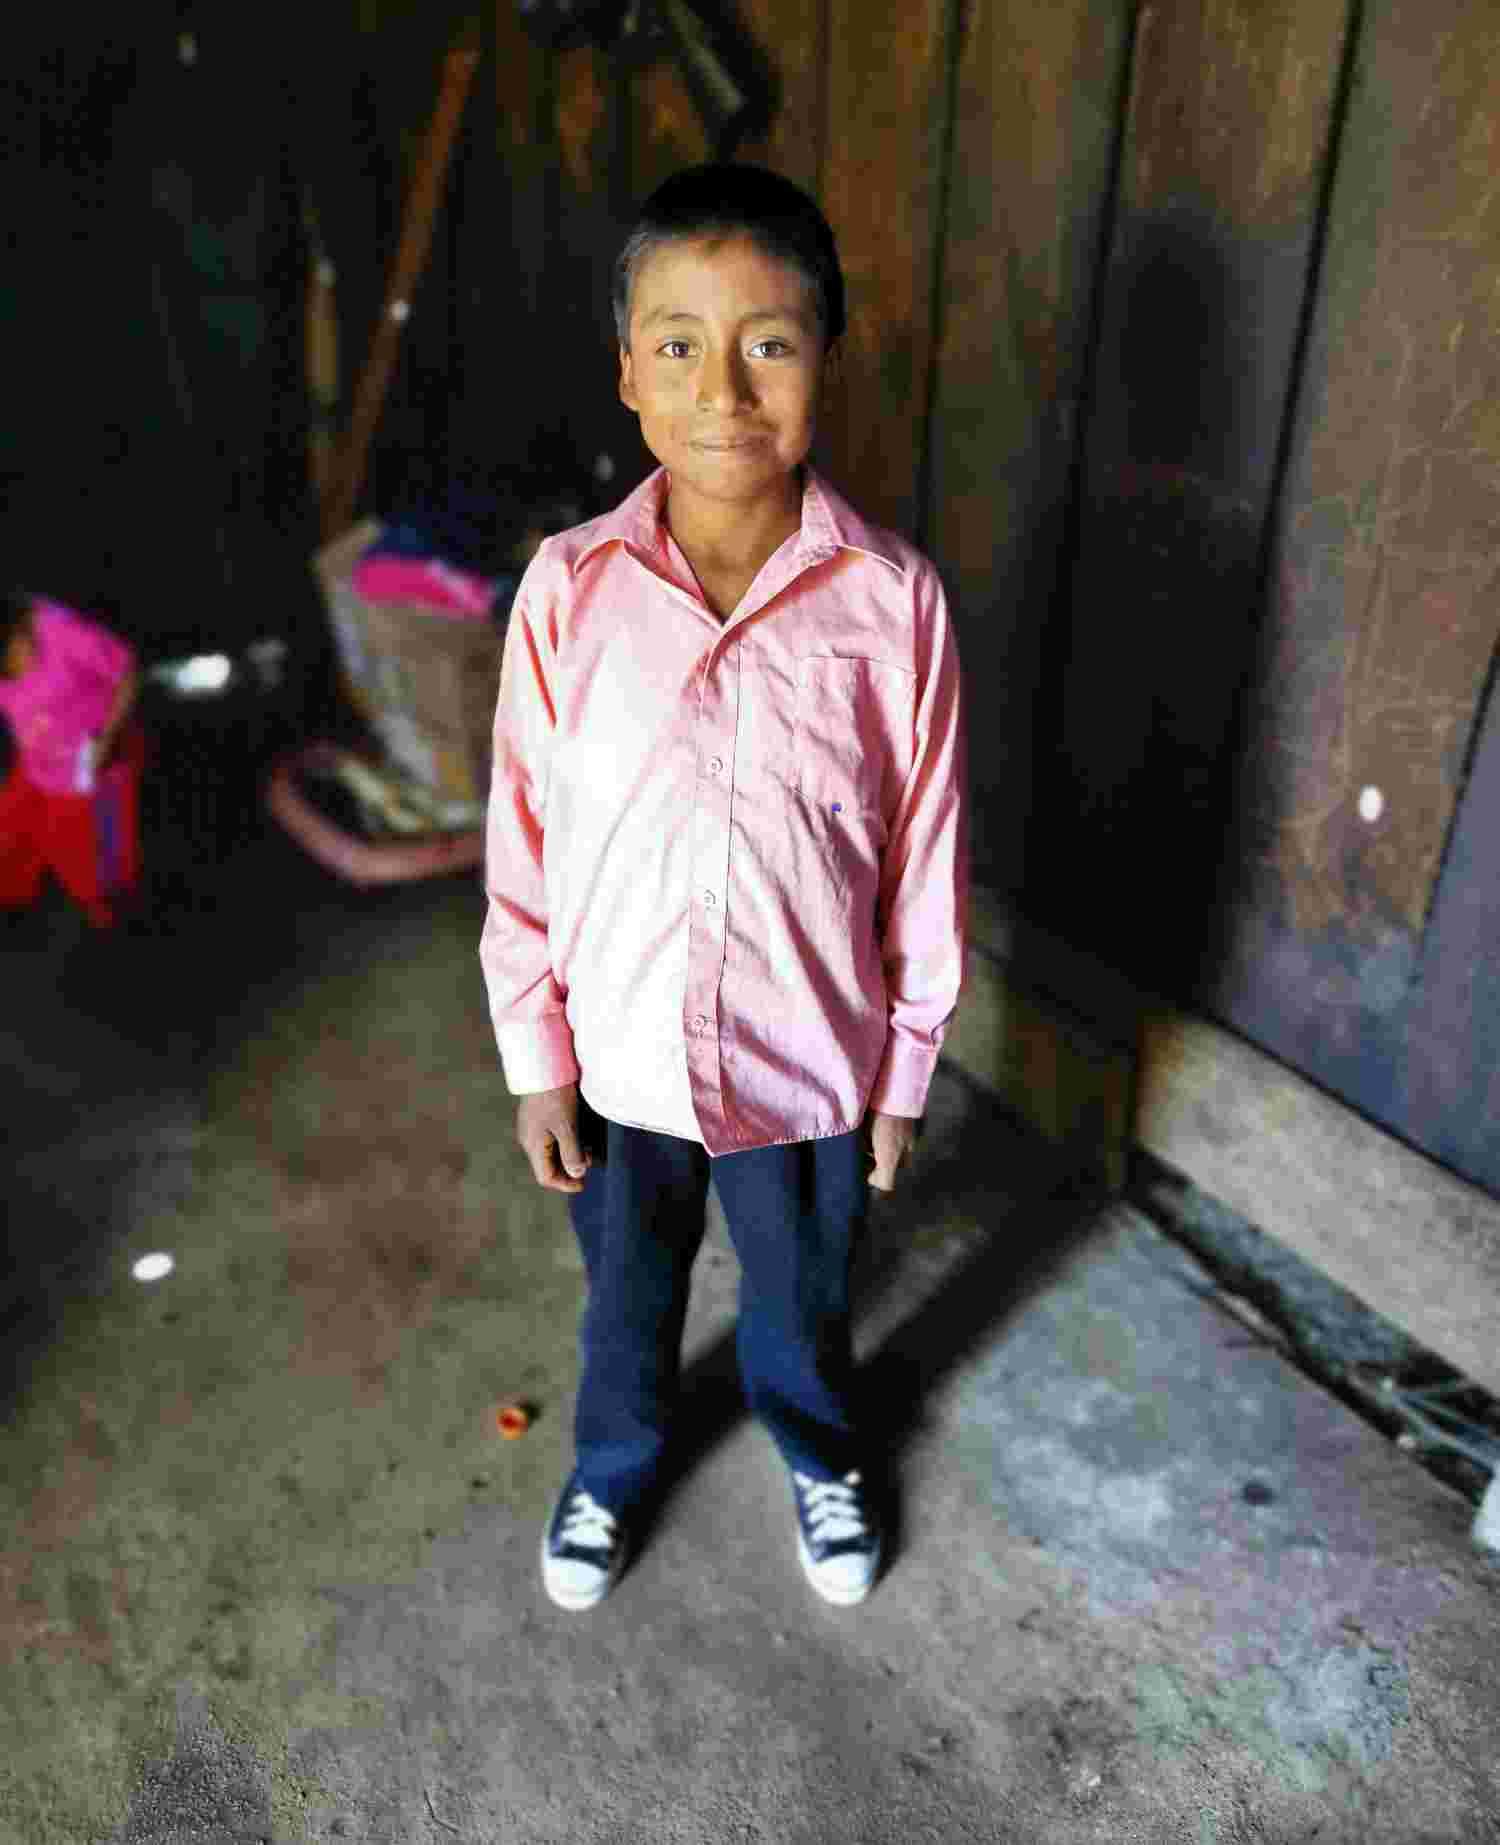 Young boy from Tajlevilhó, San Andres Larrainza Municipality, Chiapas